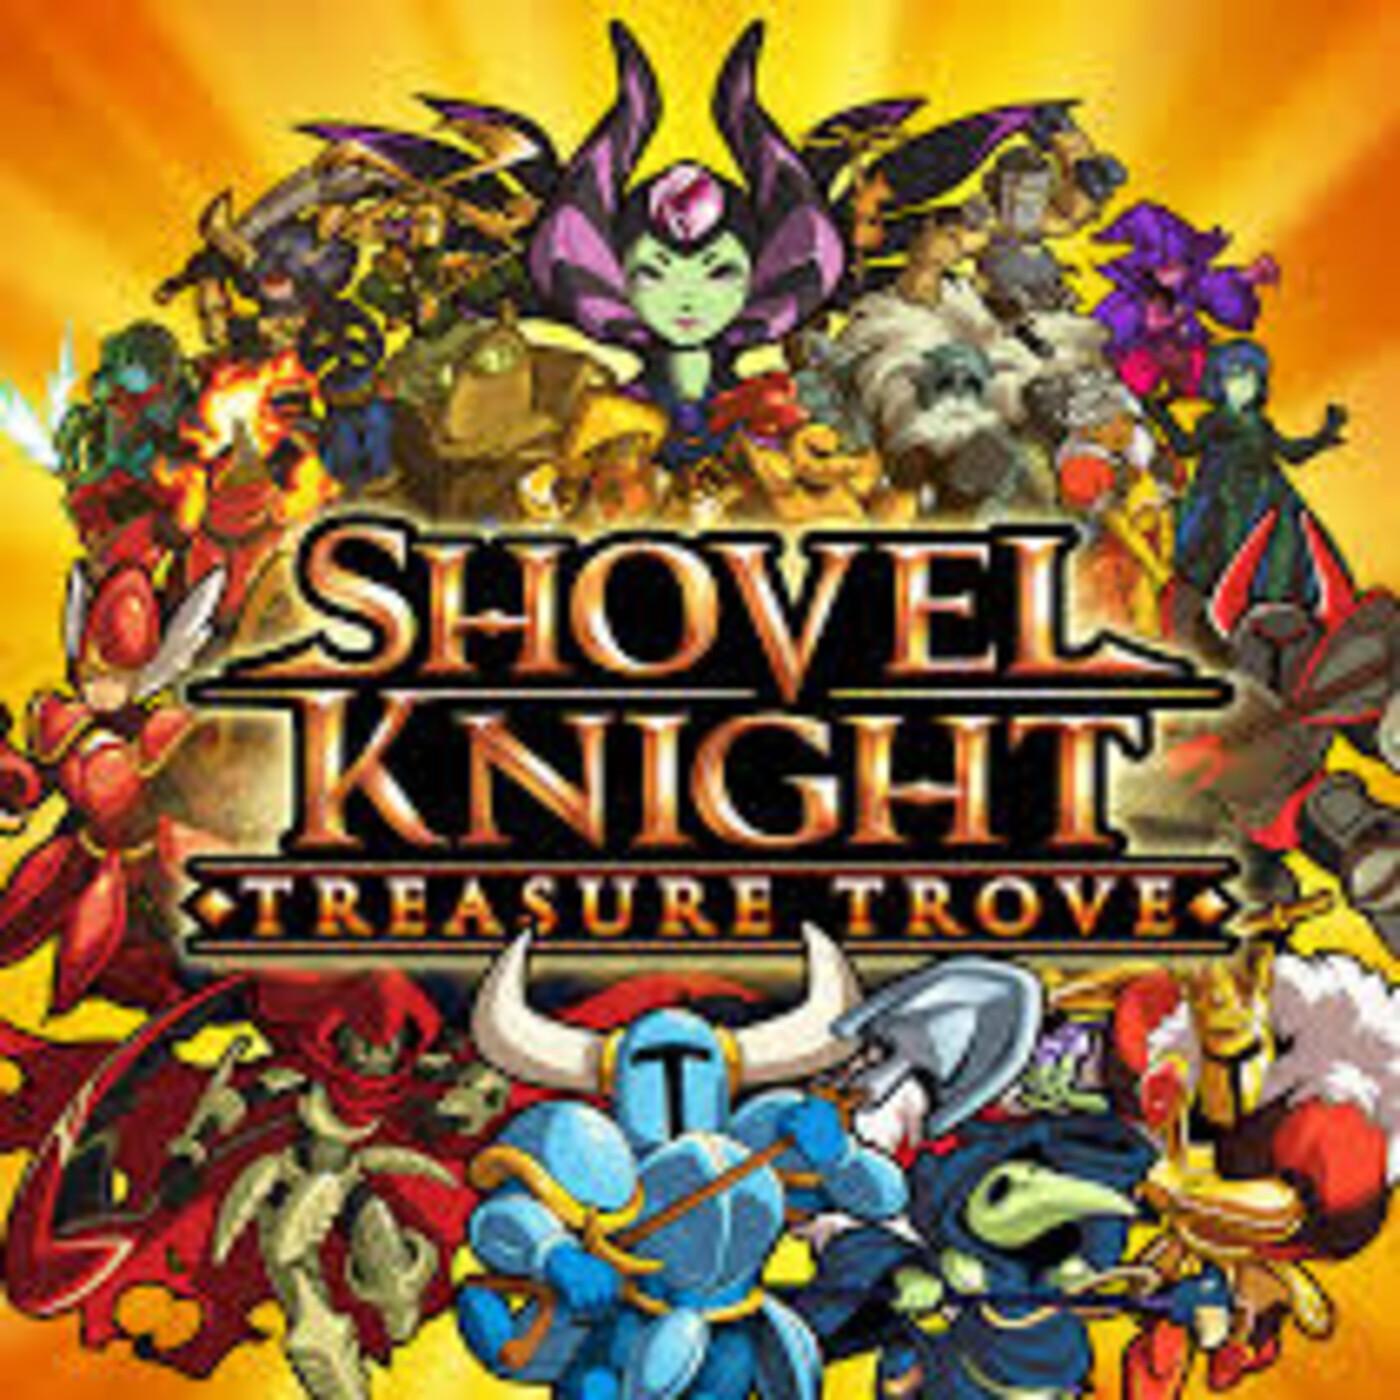 CG83-3 Shovel Knight: Treasure Trove